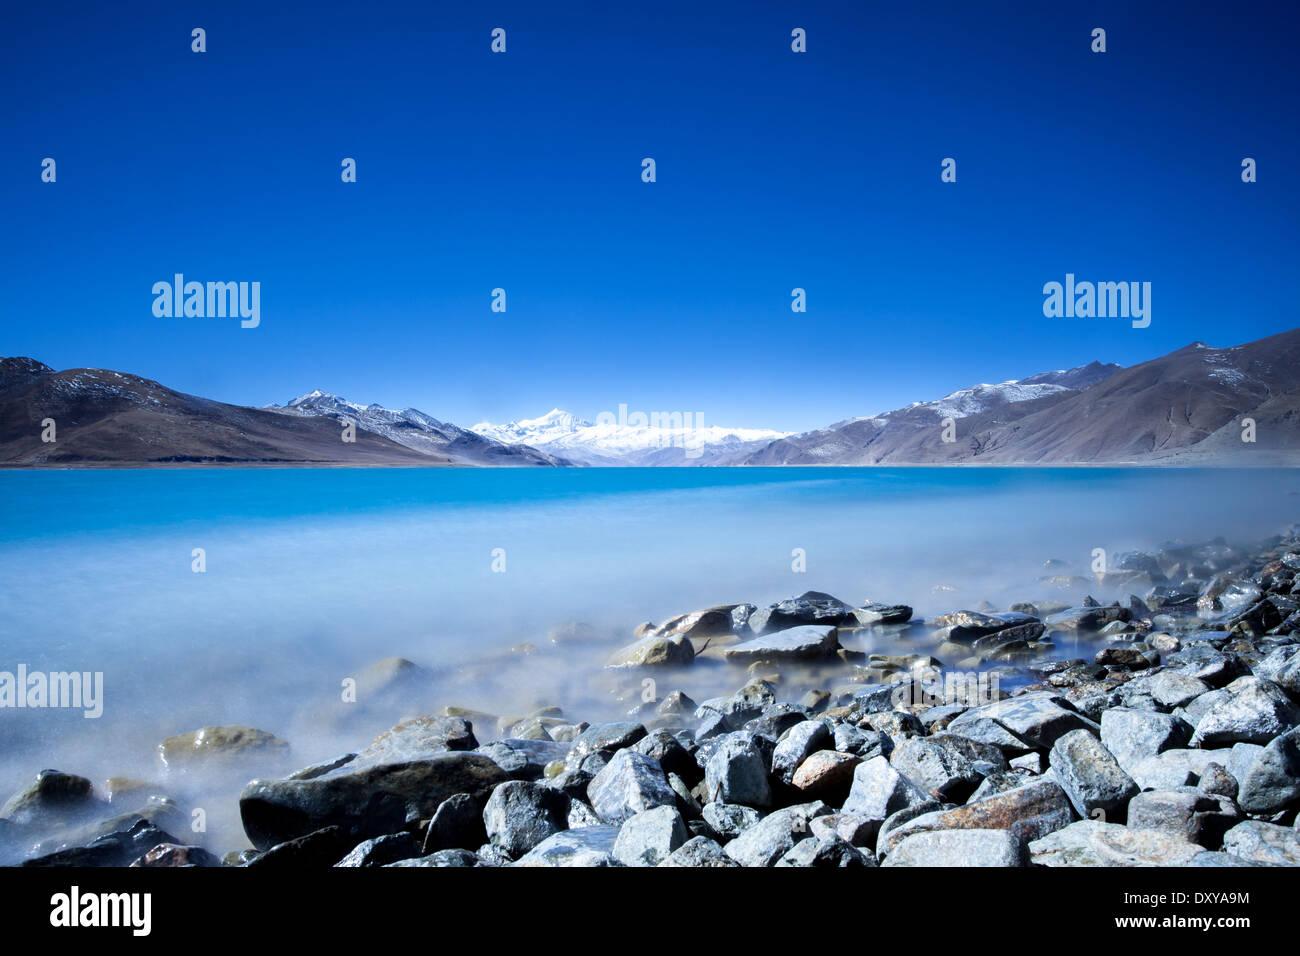 Yamdrok Lake in Tibet - Stock Image